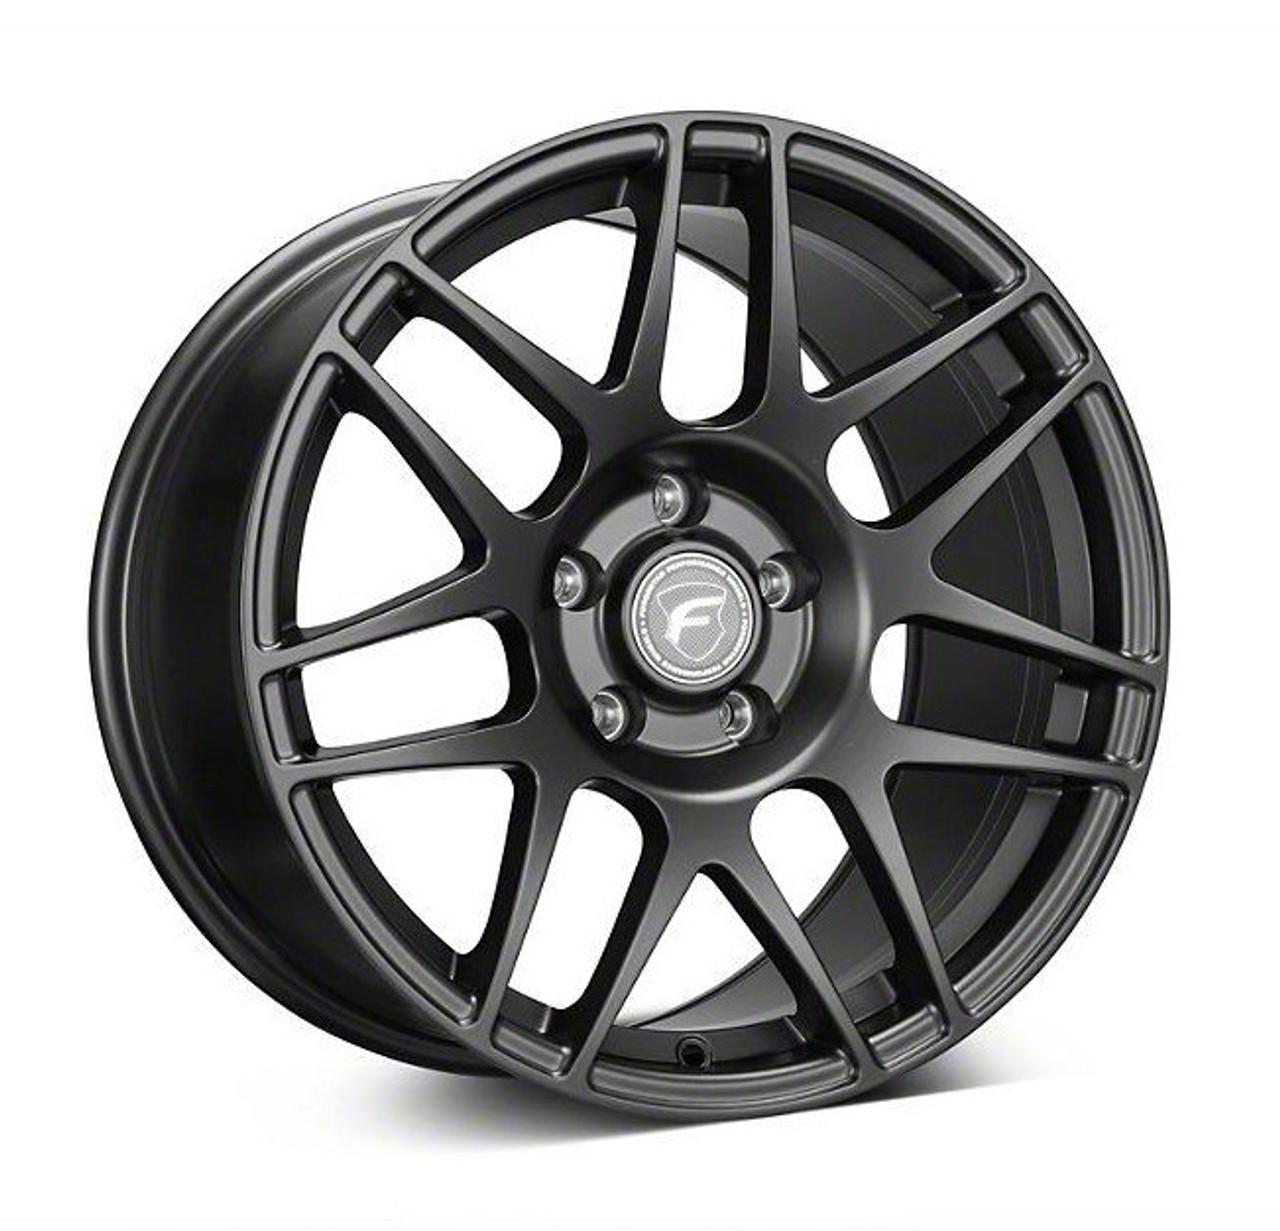 Forgestar F14 Drag Pack Matte Black Wheel 15x10 +44 5x4.75BC for 1993-2002 Camaro 4TH GEN & Firebird #1510F14MAT445475 F371B0063P44